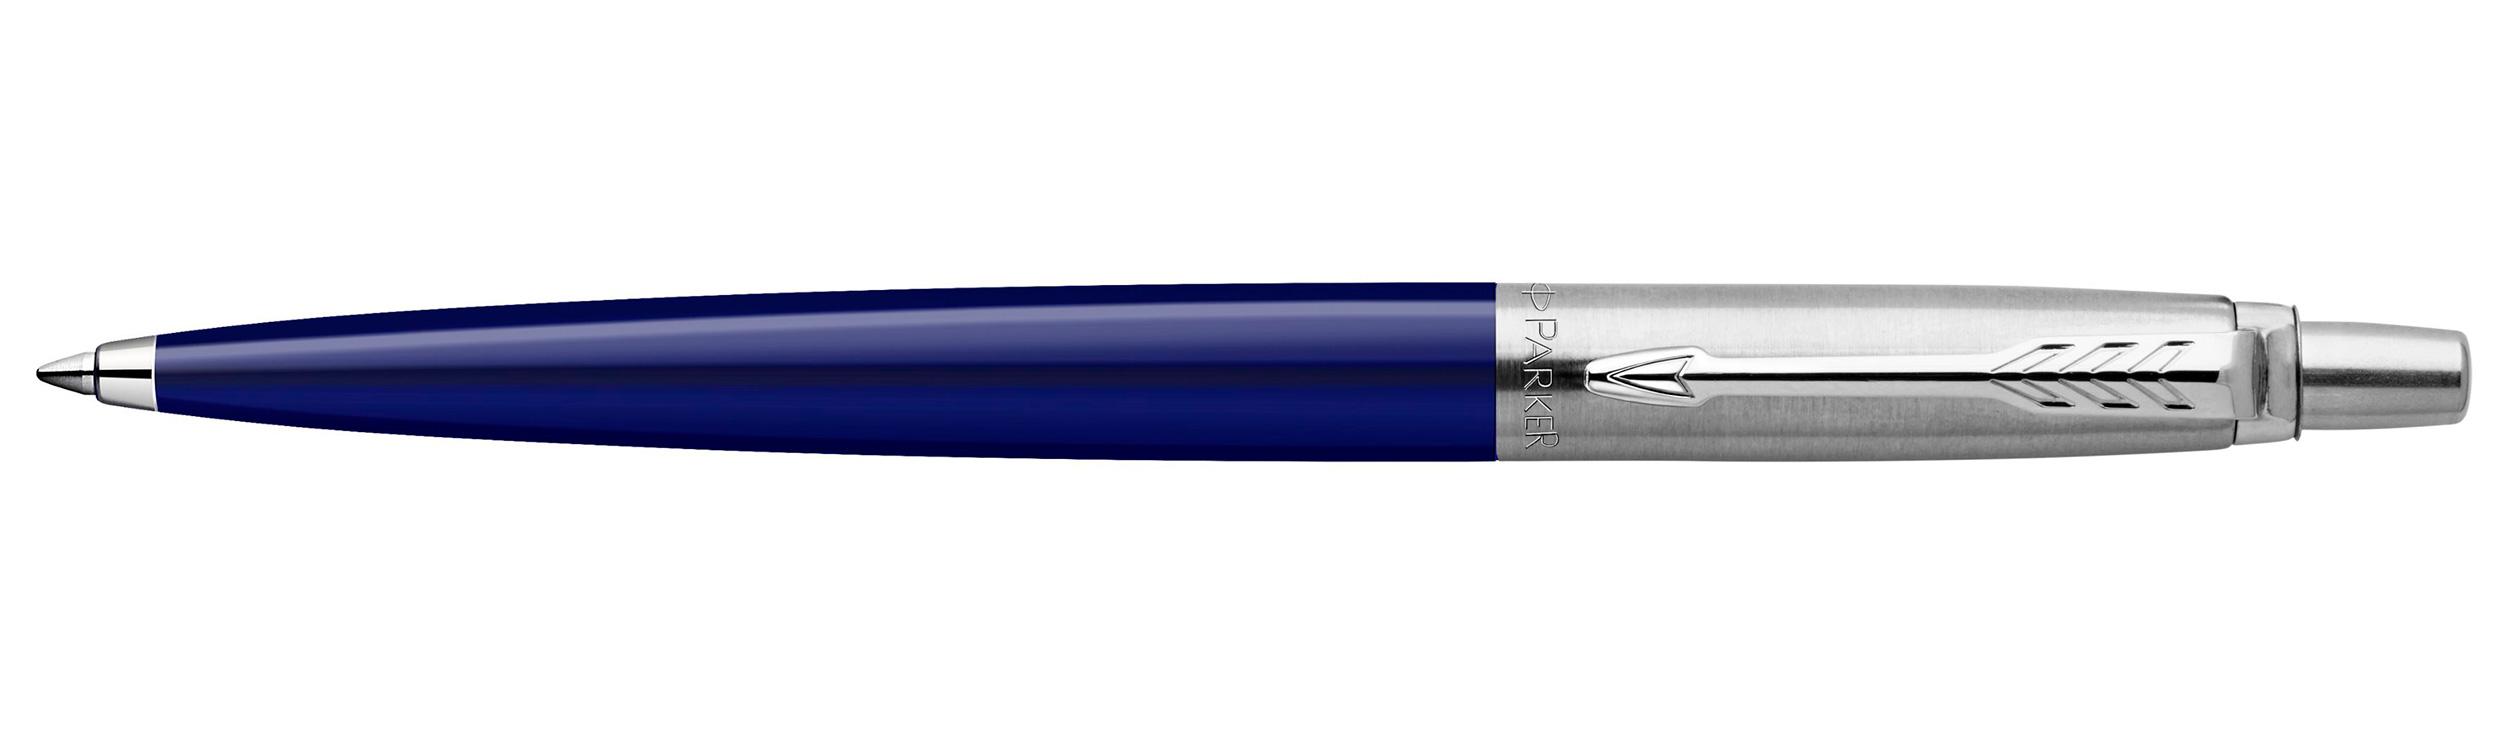 K60 (R0033170) Ручка шариковая Parker Jotter Original K60 (R0033170)